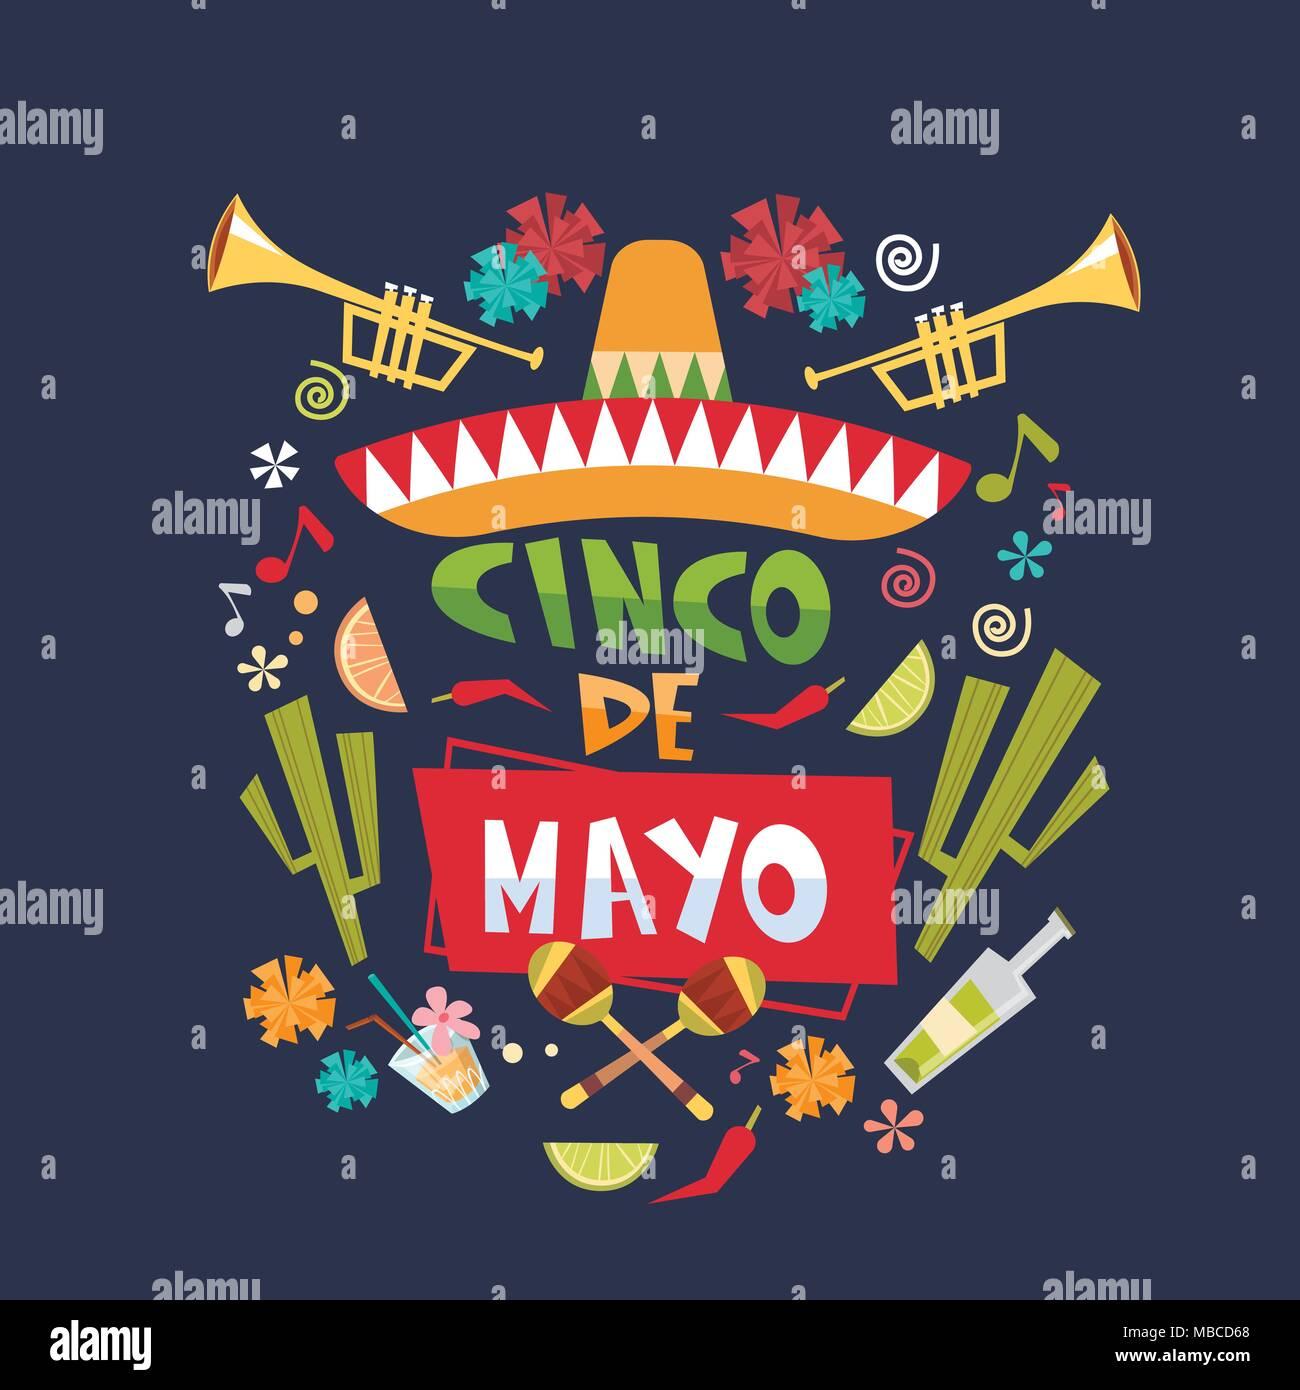 Viva mexico sombrero poster icon stock photos viva mexico sombrero cinco de mayo background mexican holiday greeting card or poster design stock image m4hsunfo